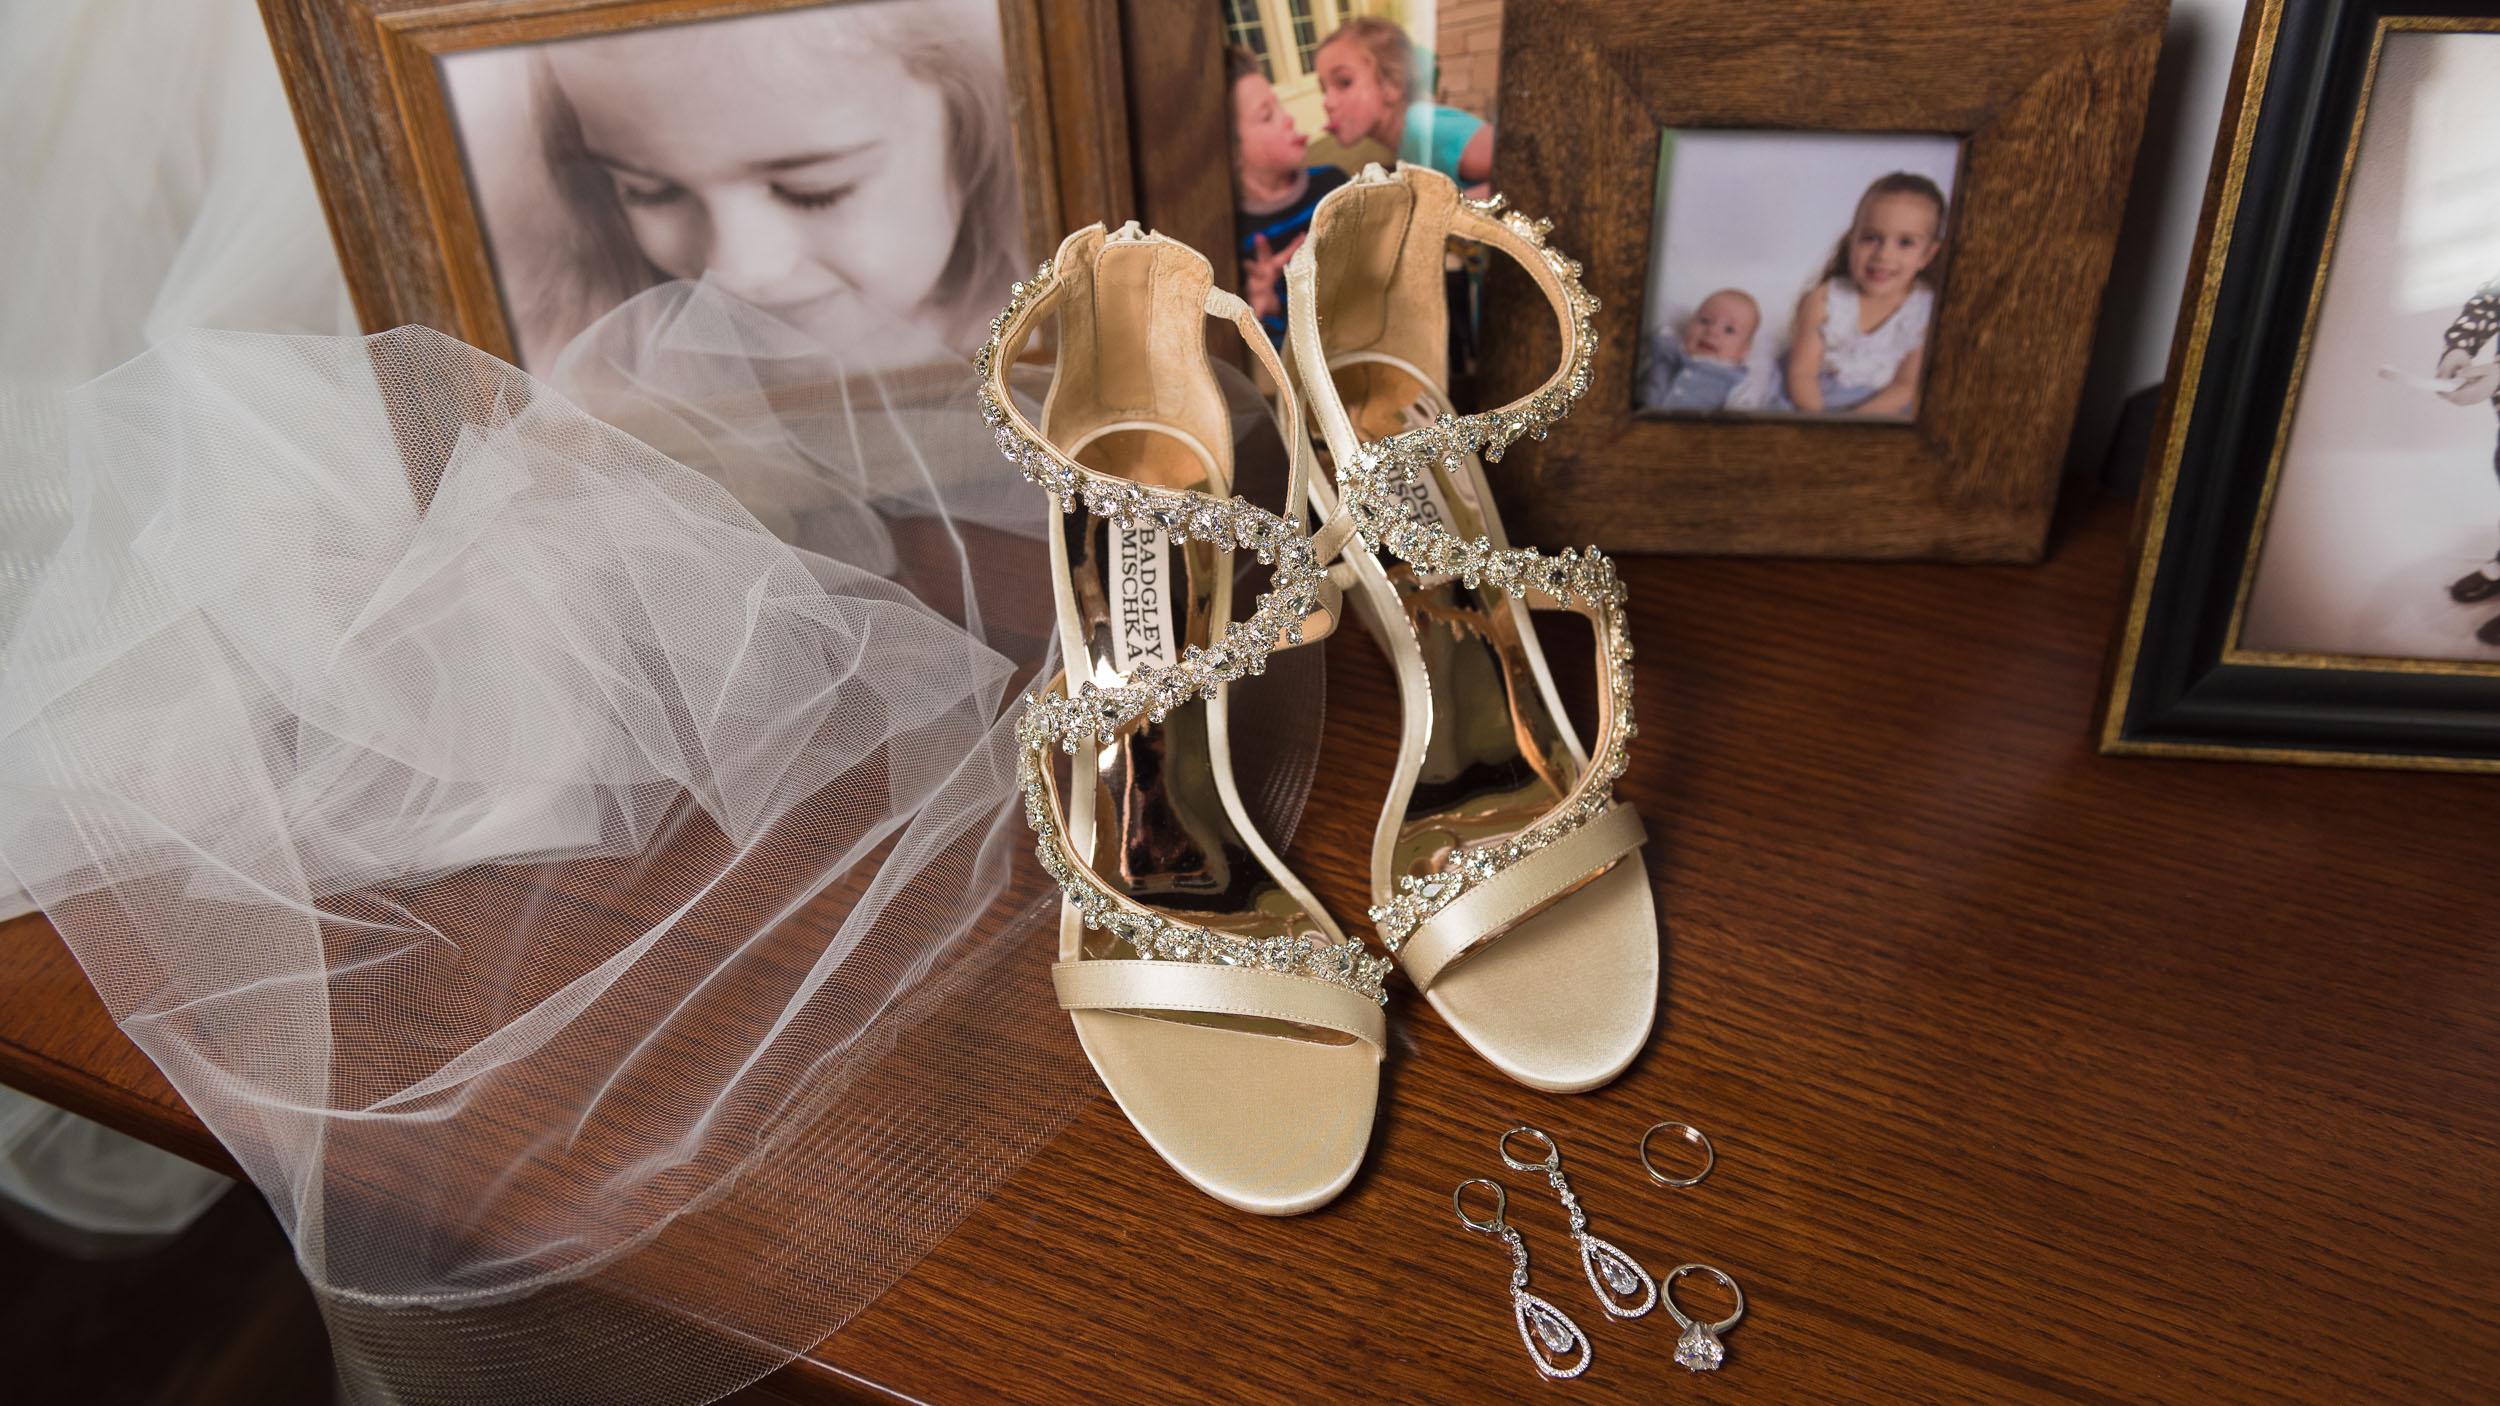 wedding-veil-and-shoes-with-framed-photos.jpg